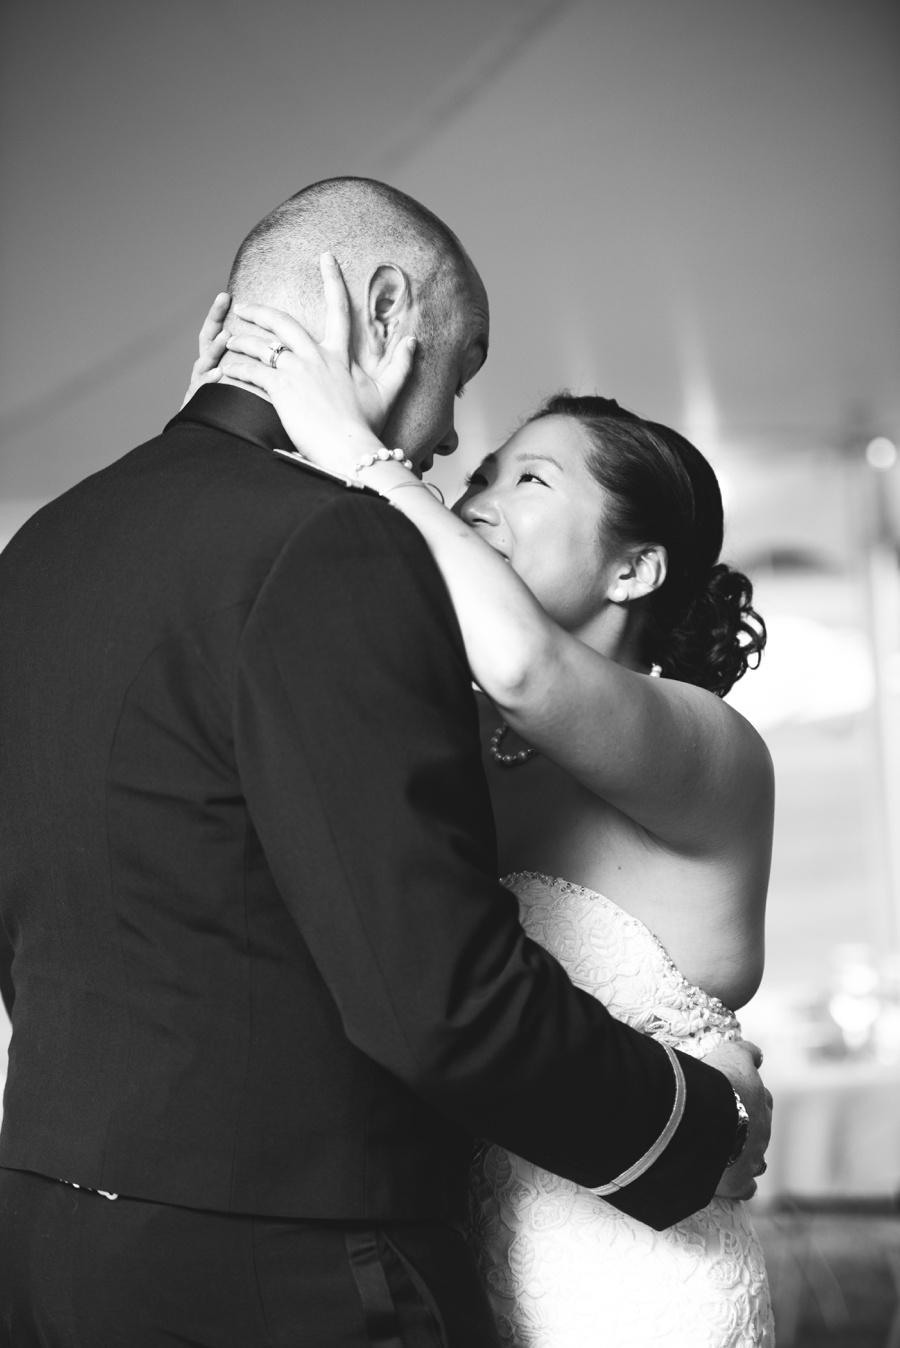 37pennsylvania-creative-wedding-photography.jpg